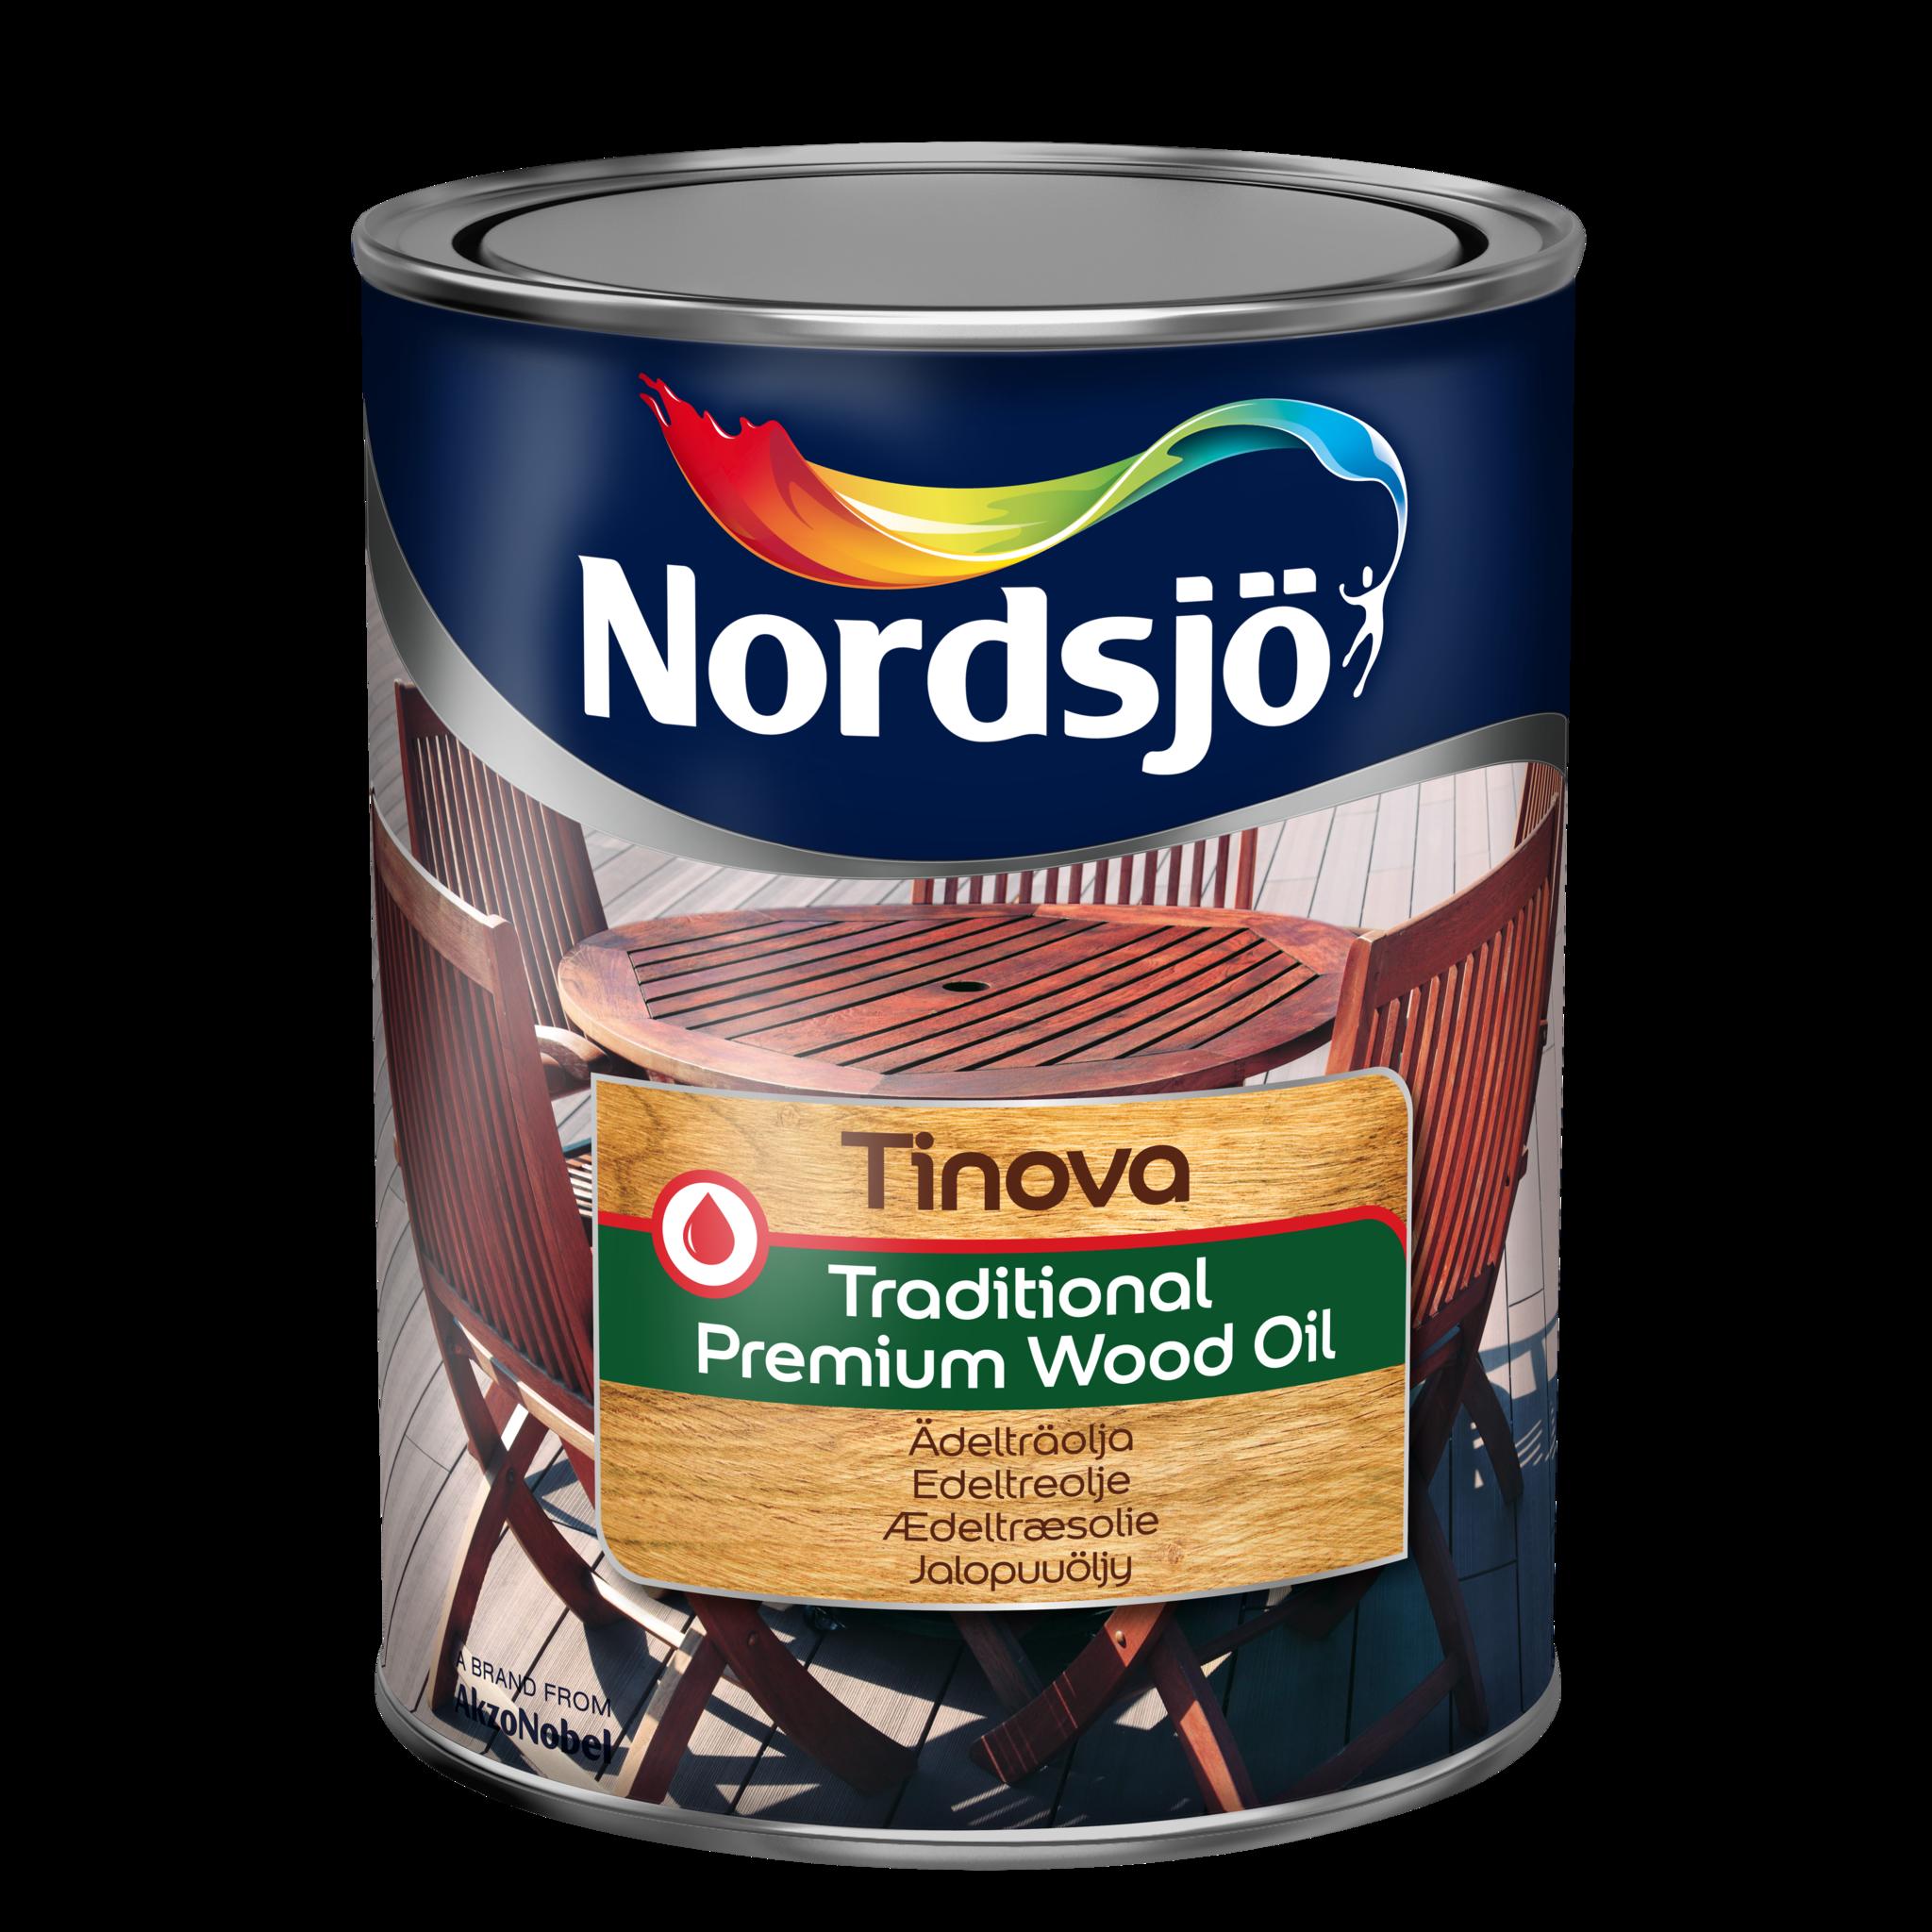 Nordsjö Tinova Traditional Premium Wood Oil